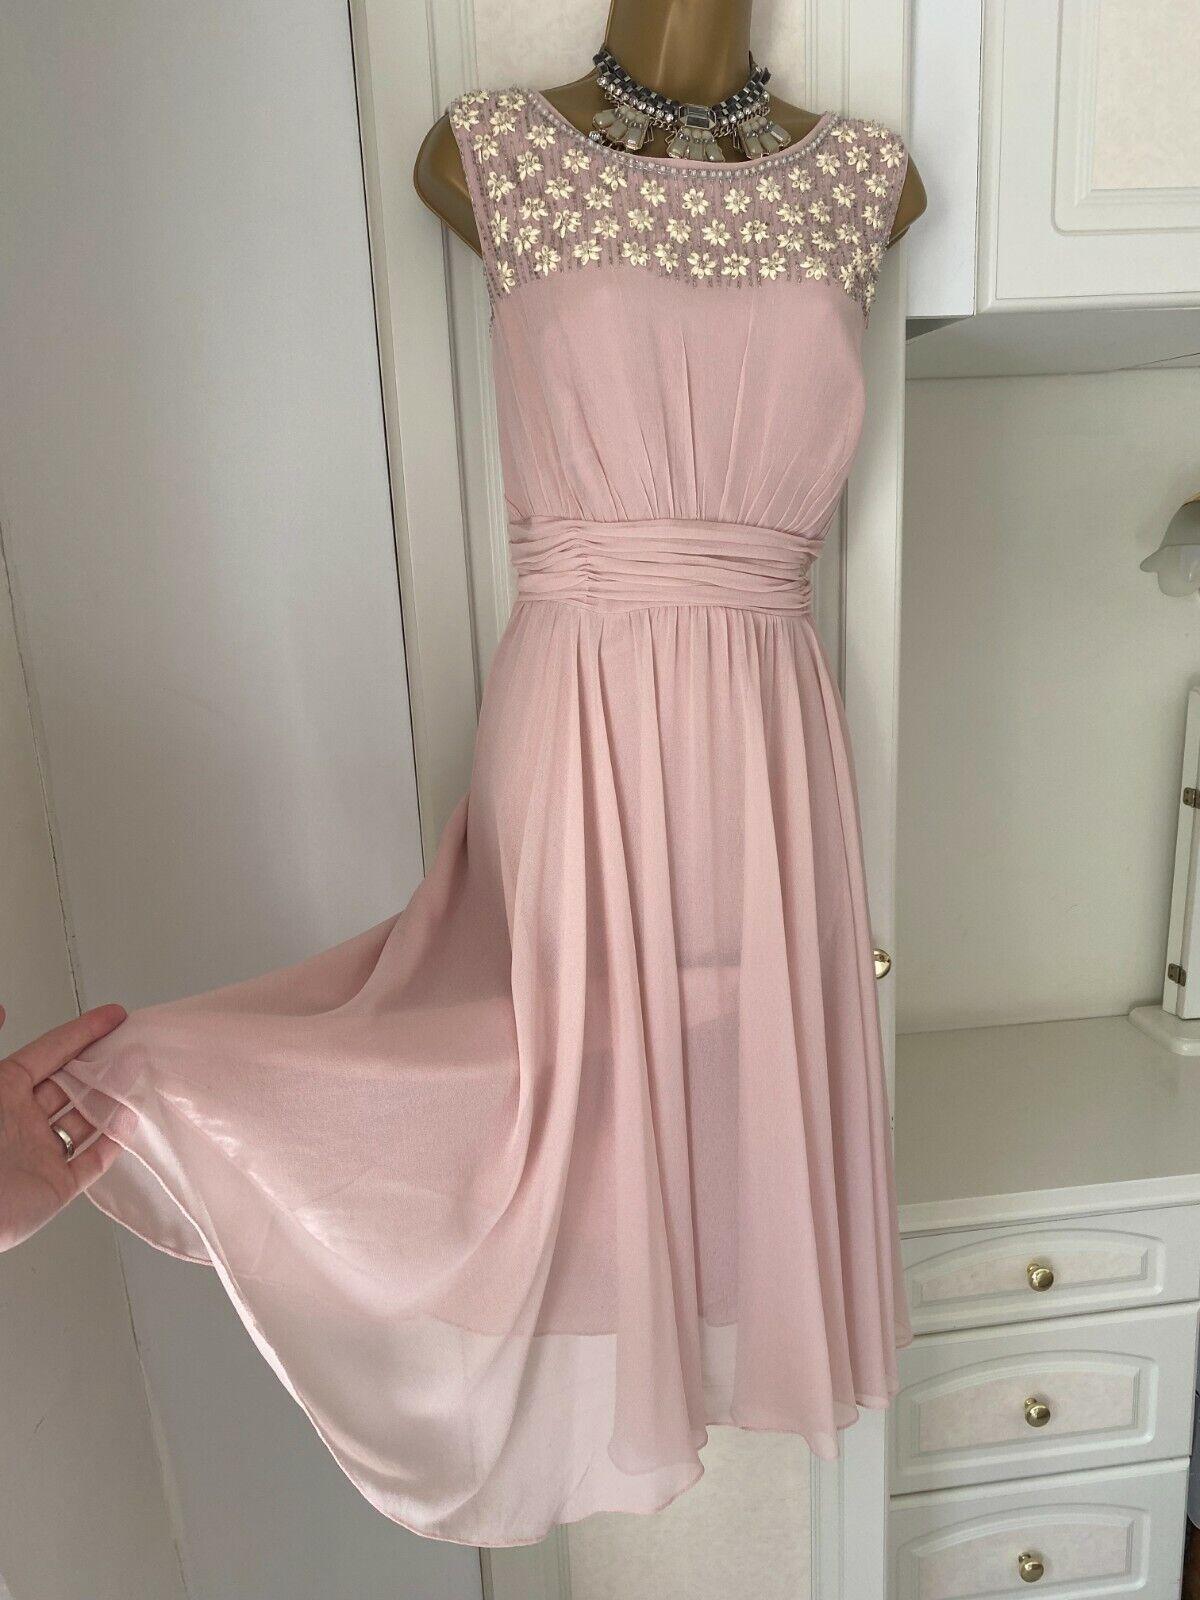 Jenny Packham Size Uk 16 Classy Lined Chiffon/Beaded Quality Dress Bust 40